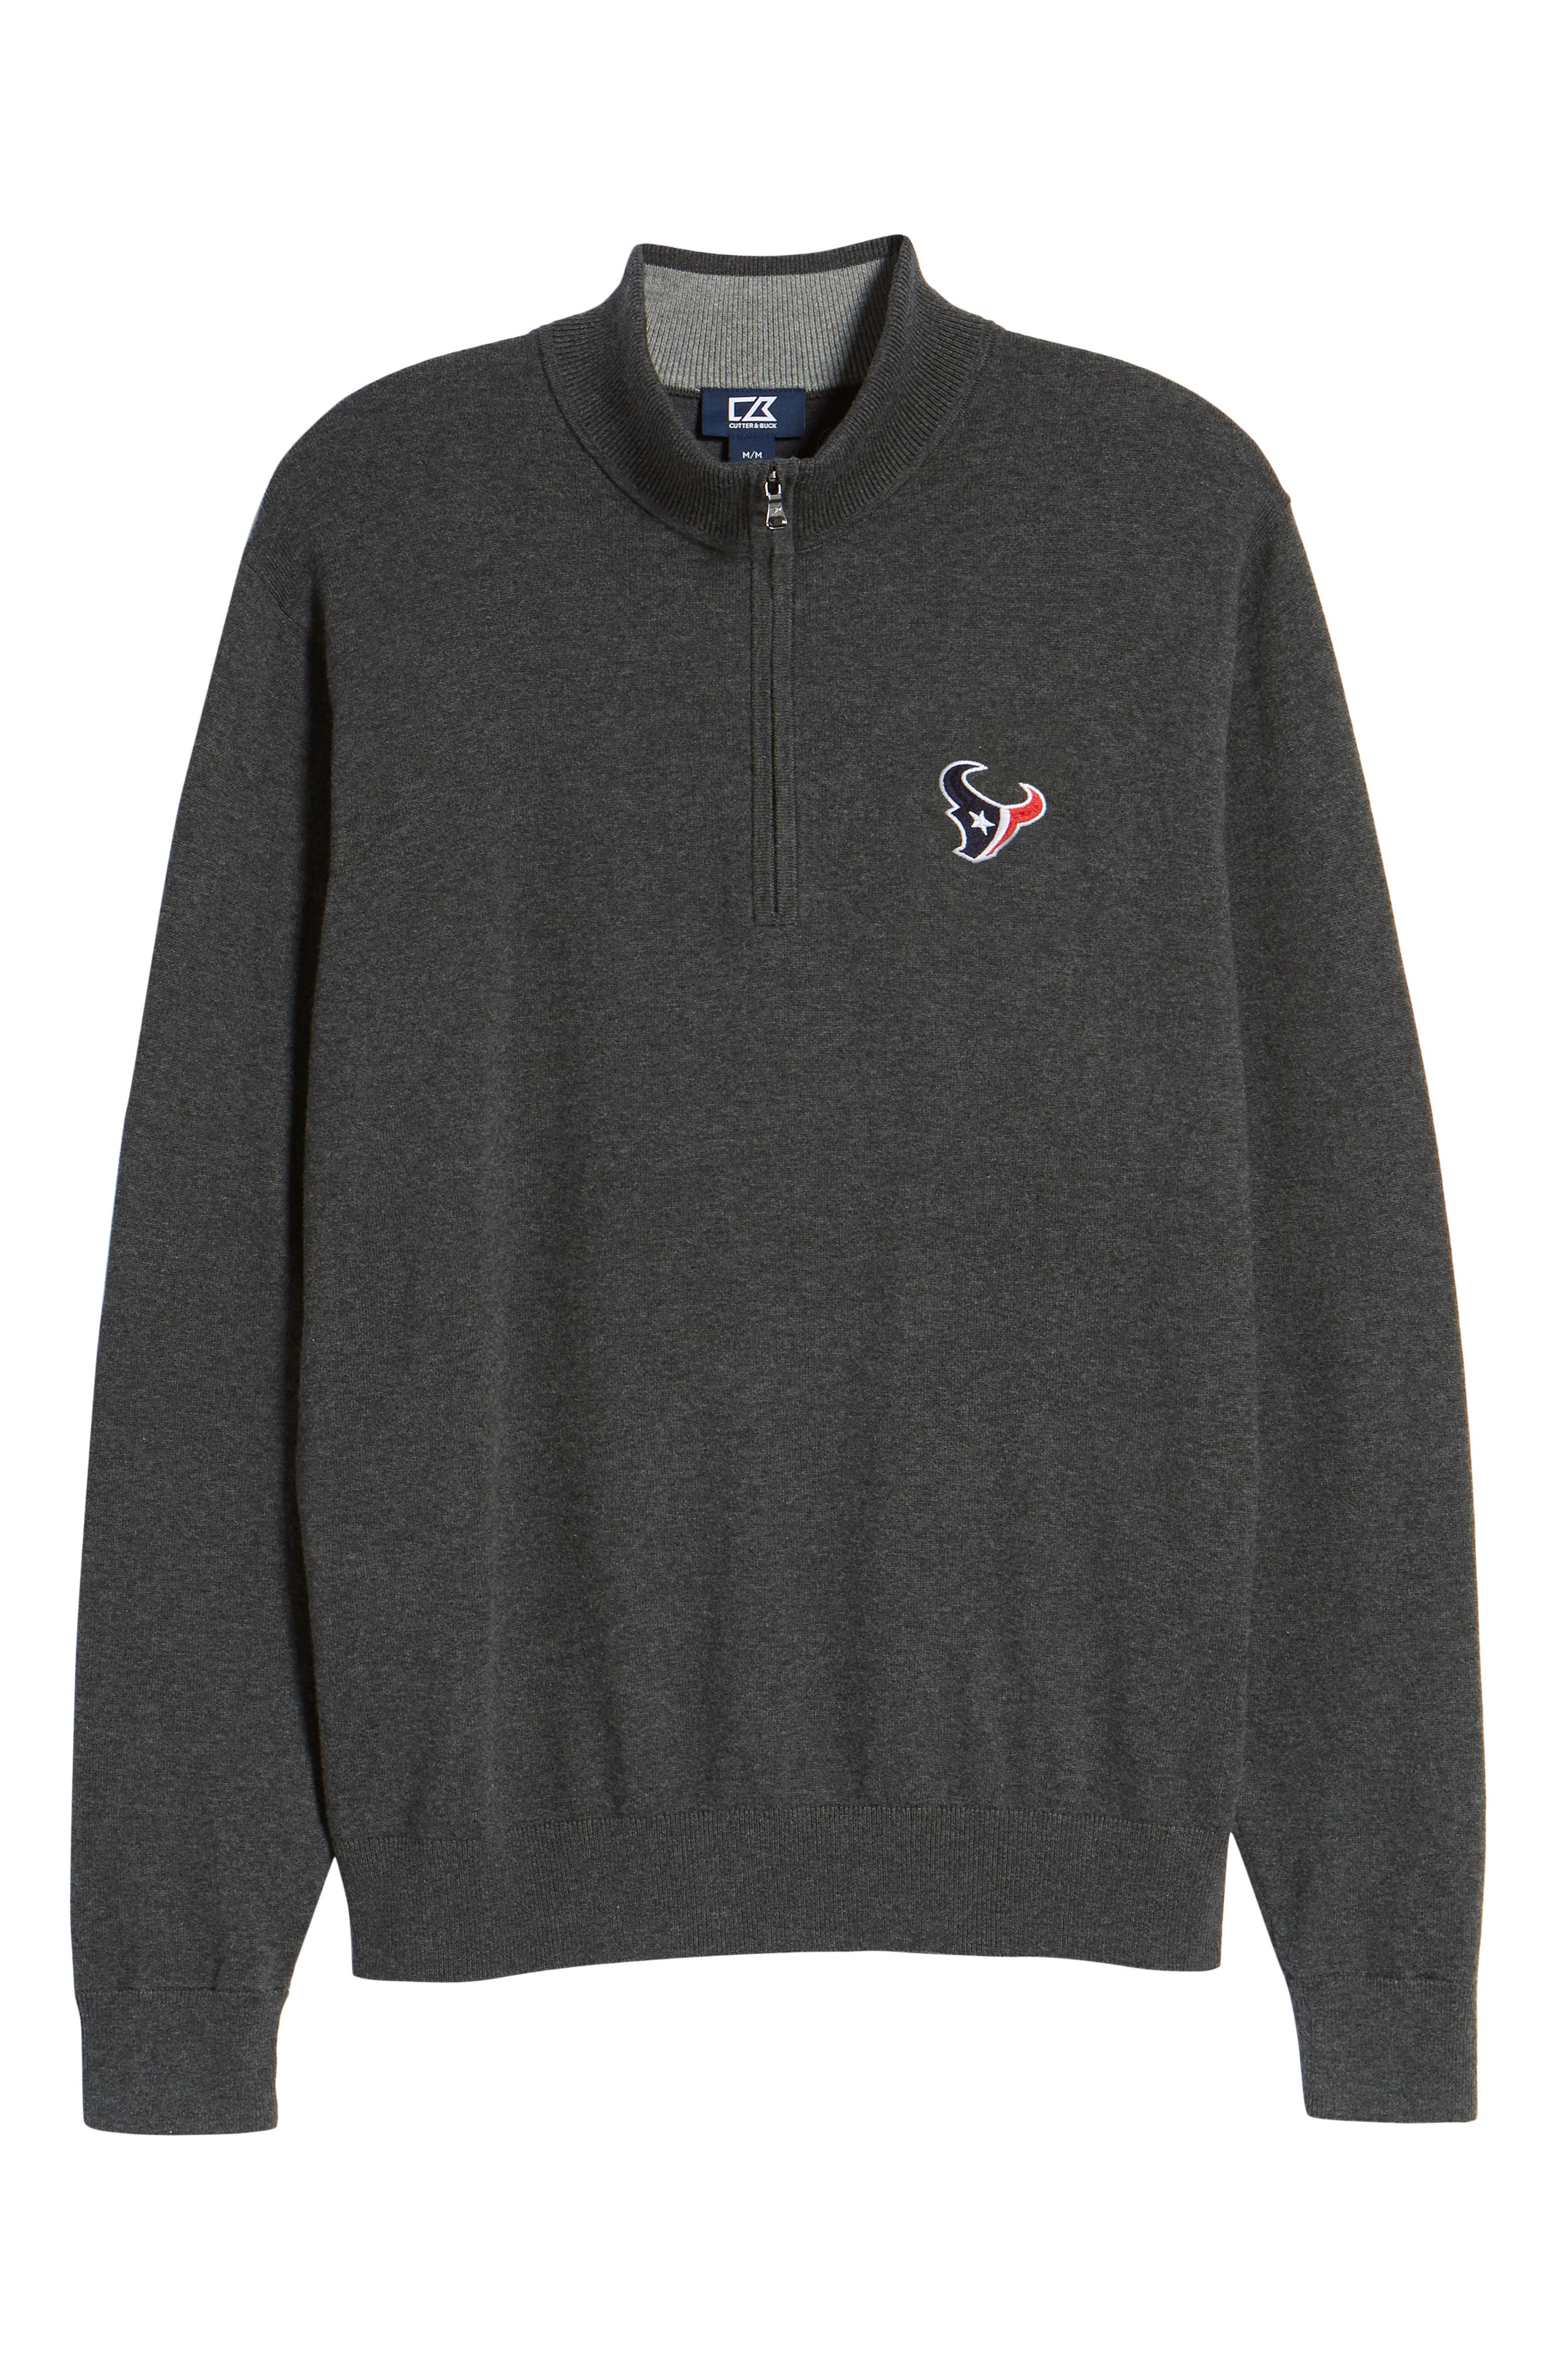 Houston Texans - Lakemont Regular Fit Quarter Zip Sweater,                             Alternate thumbnail 6, color,                             CHARCOAL HEATHER